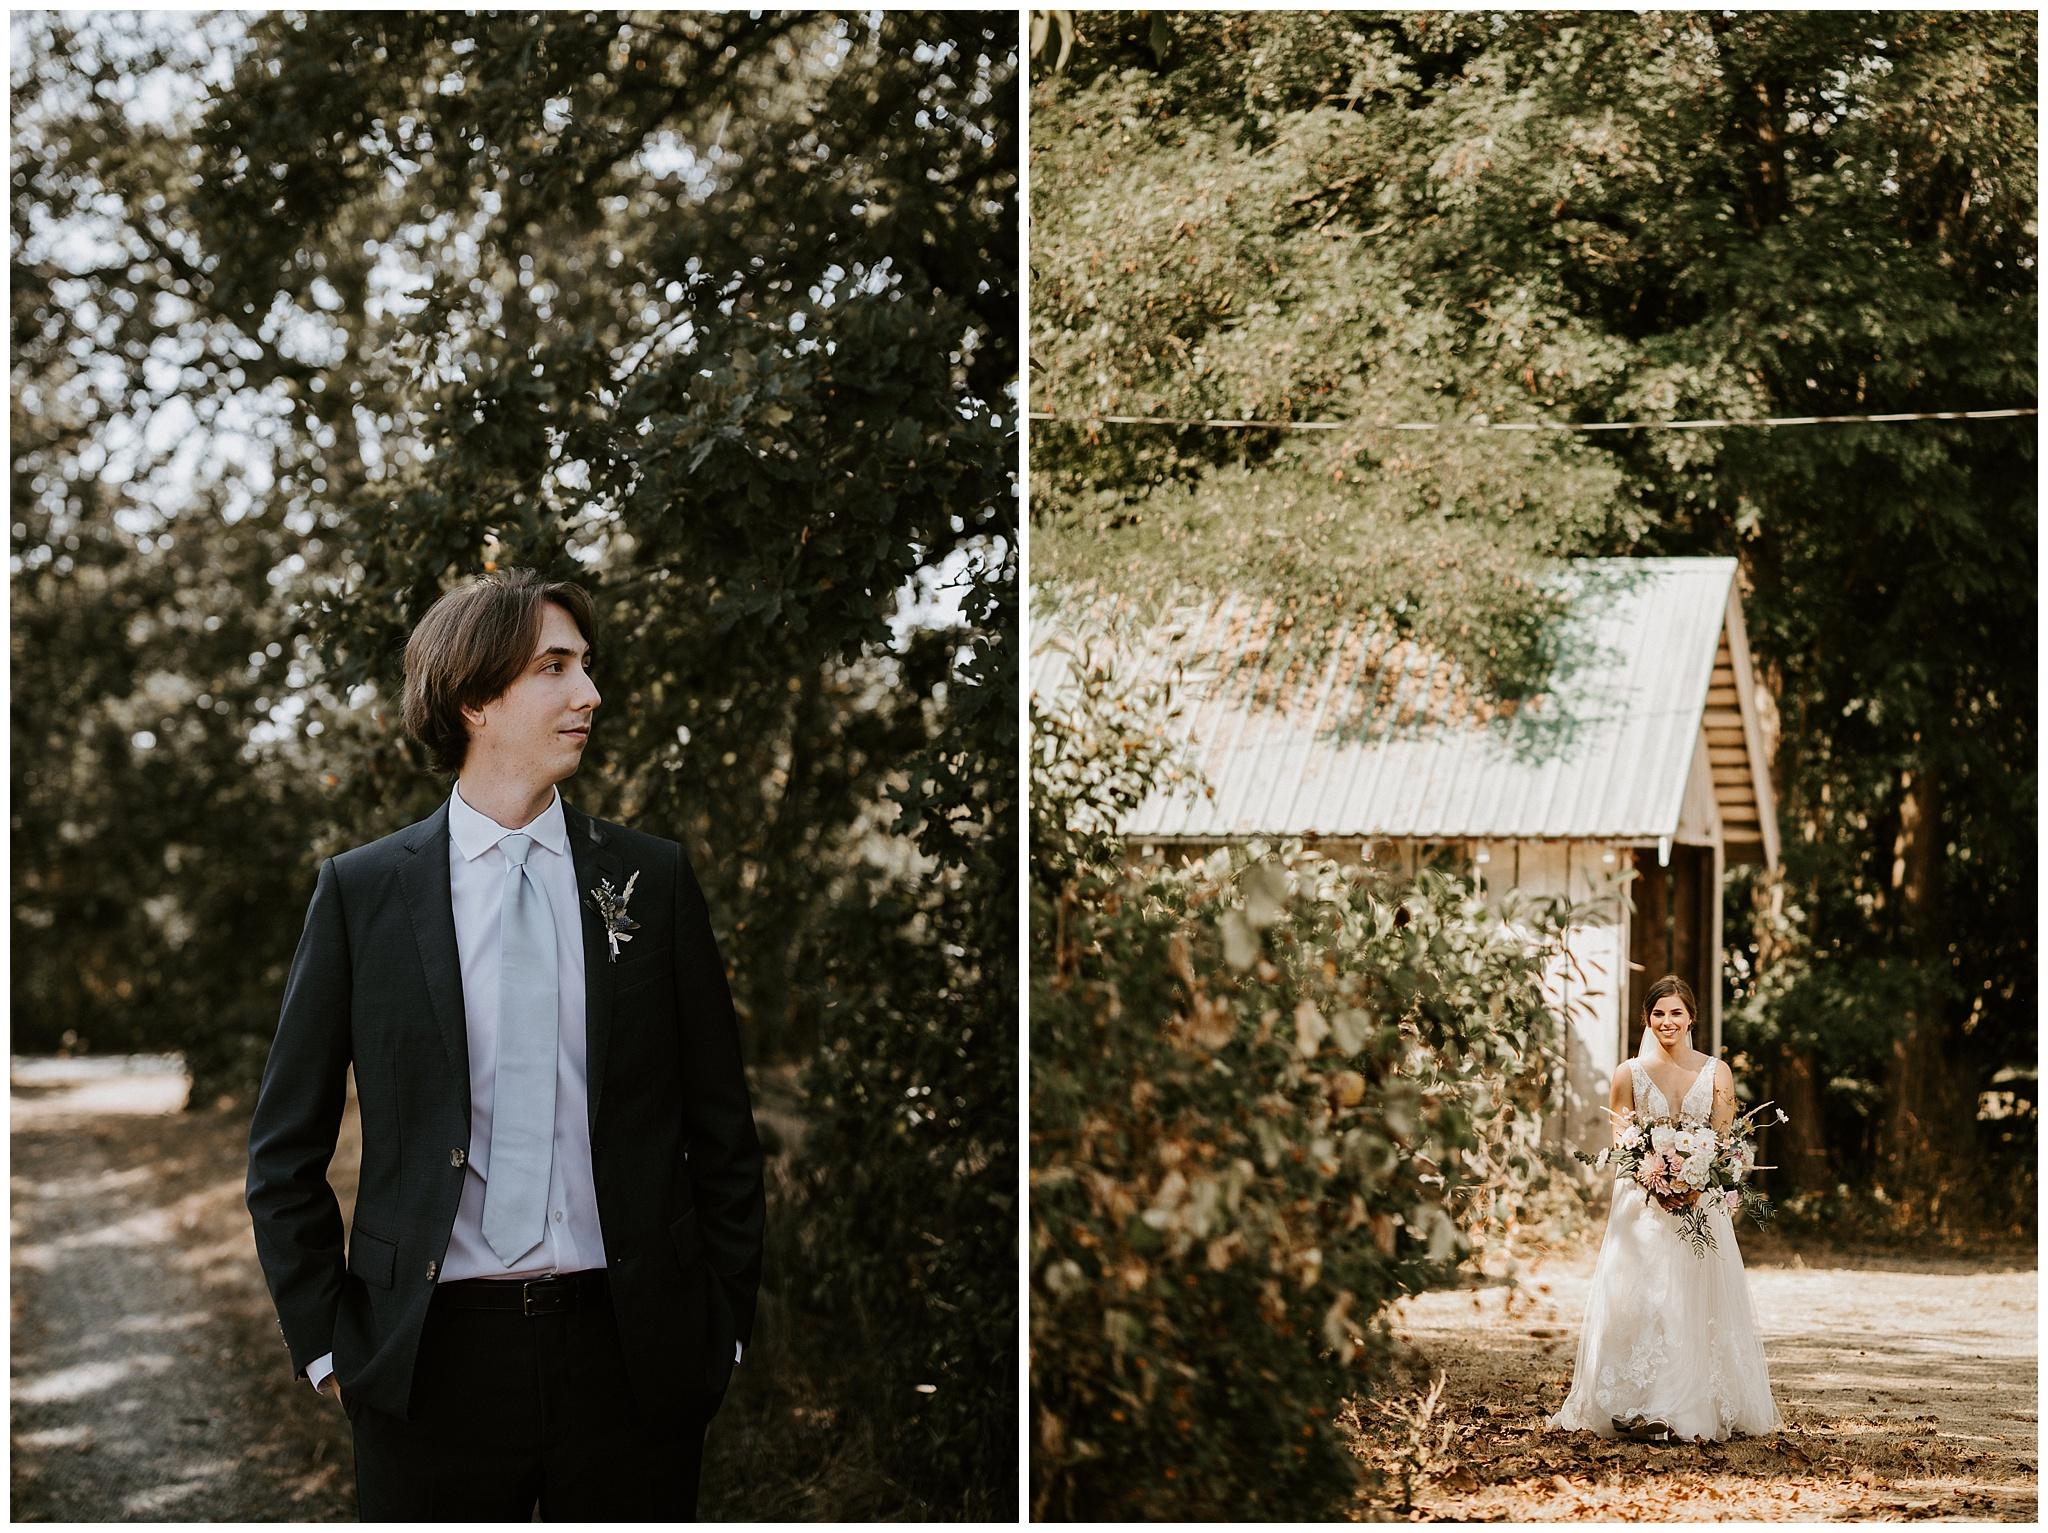 estate-248-wedding-langley-017.JPG